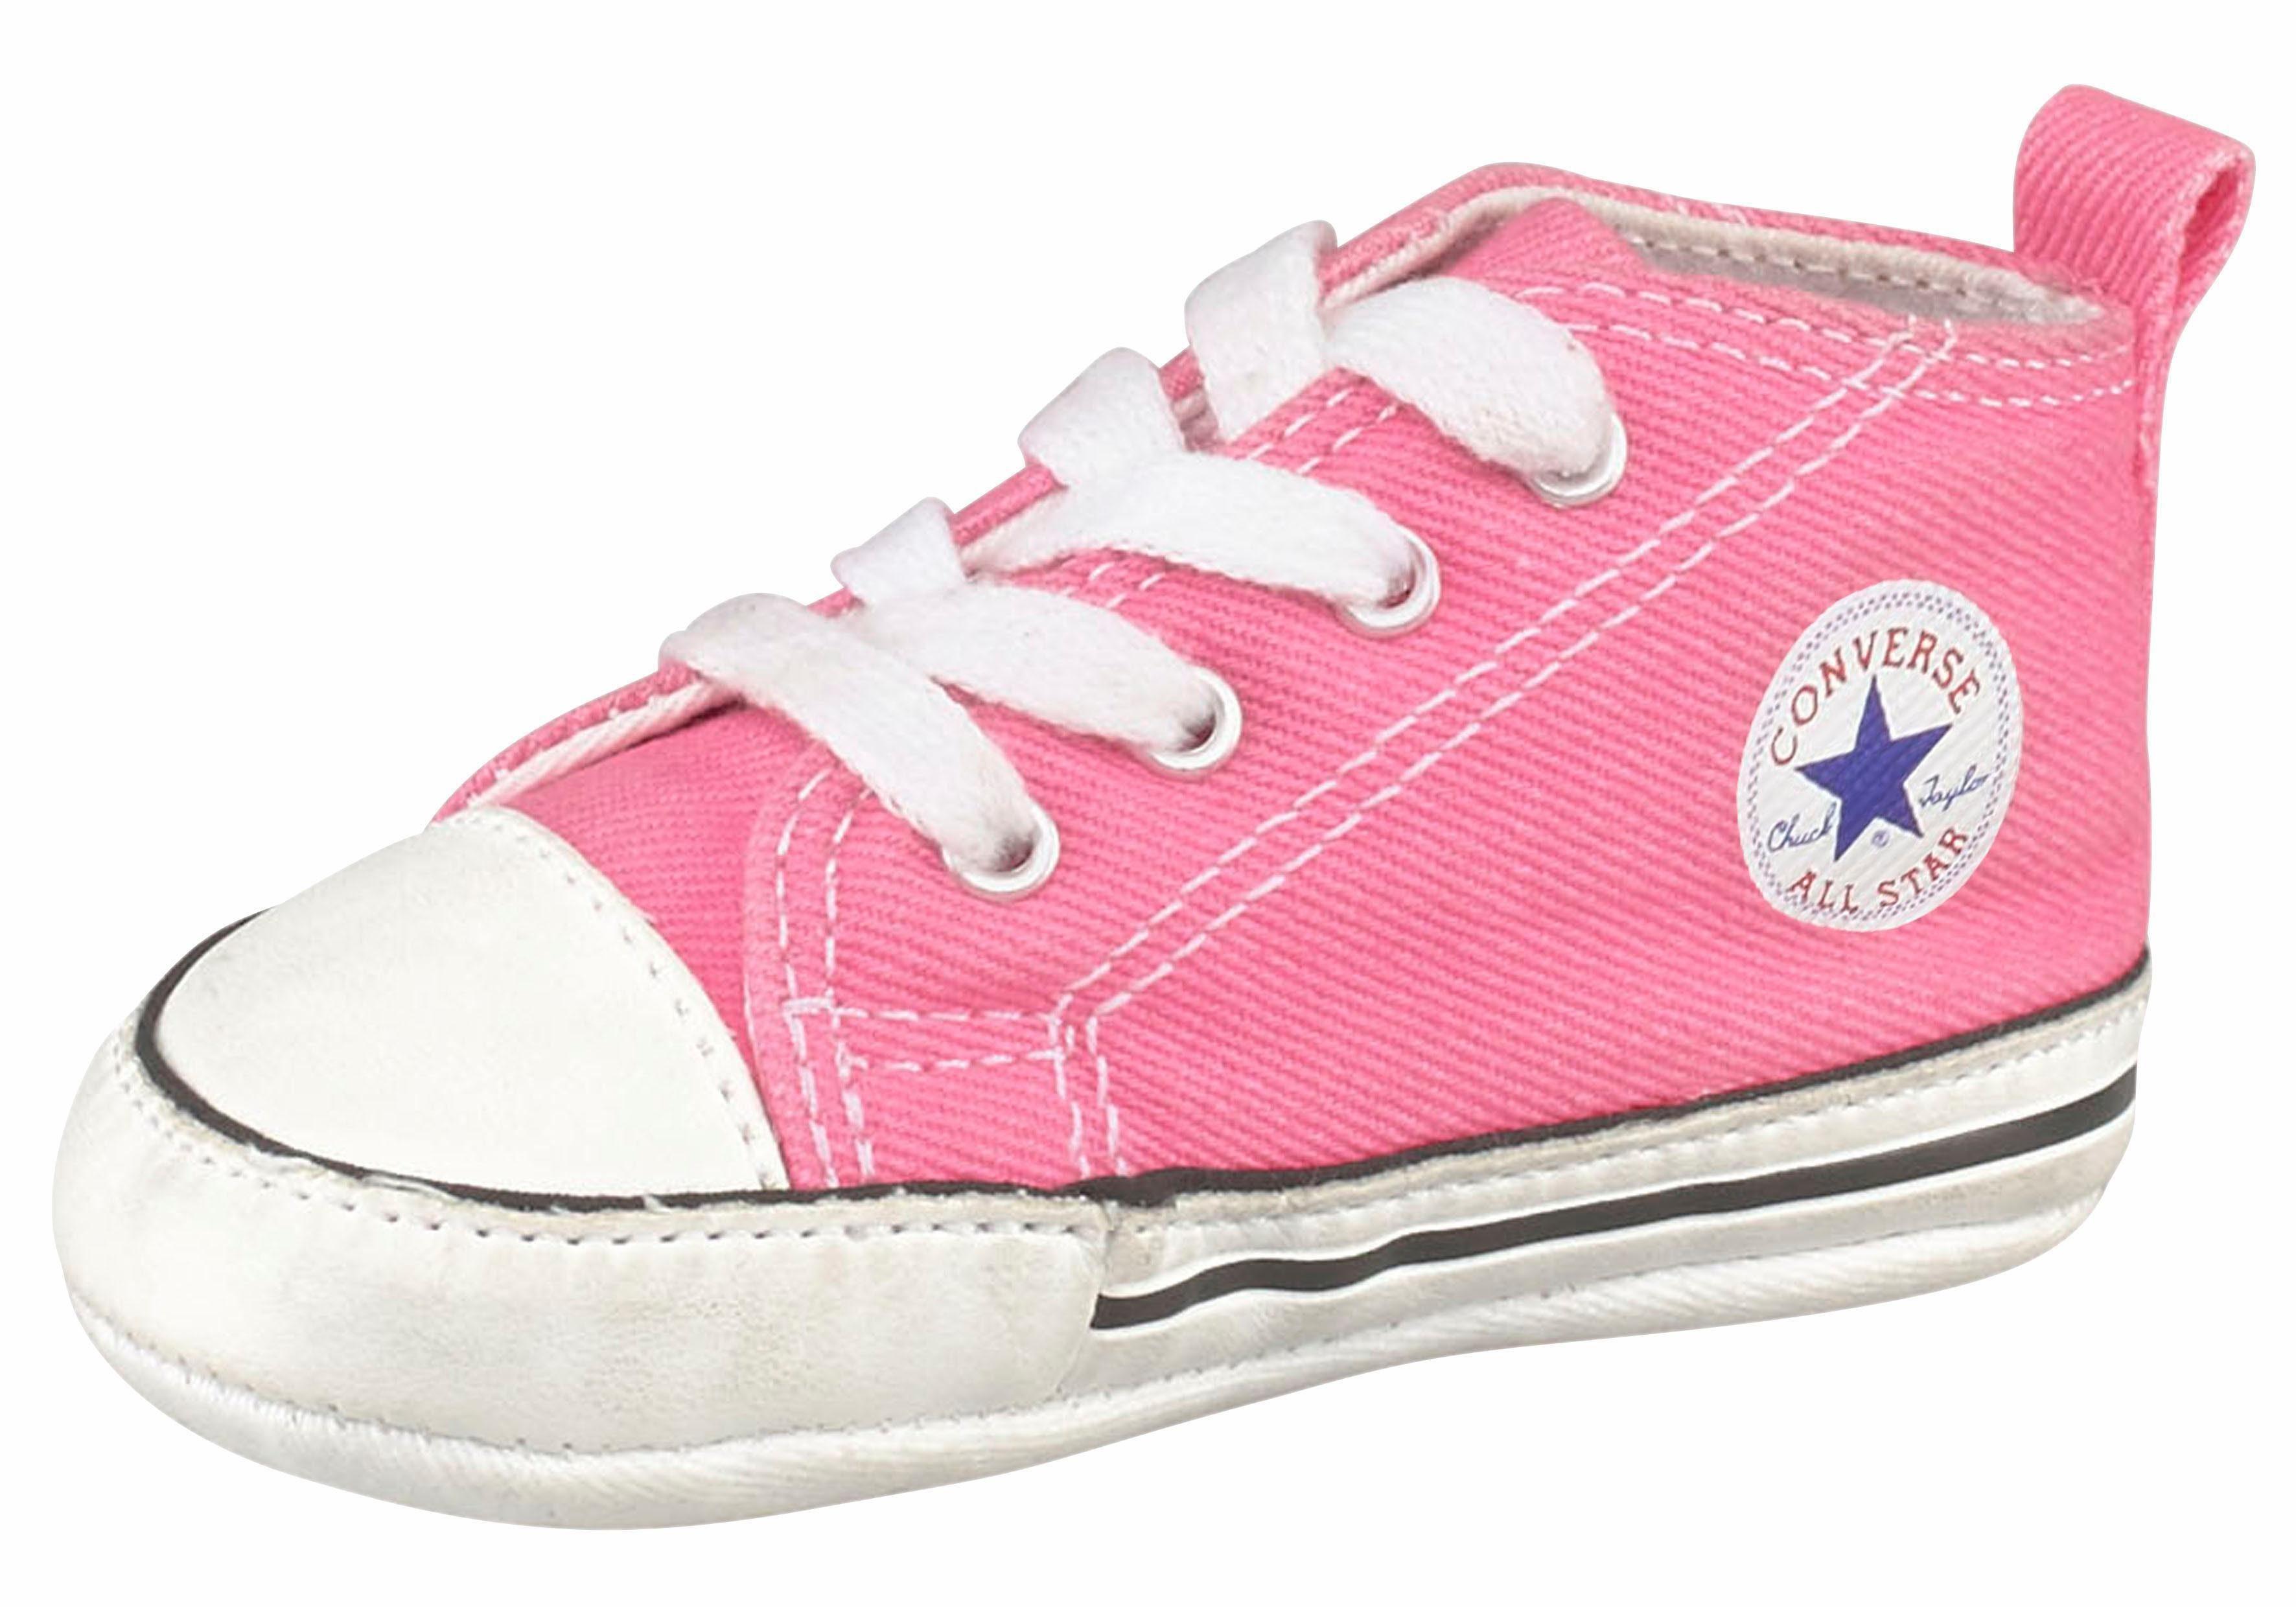 Converse »Chuck Taylor All Star First Star« Sneaker Baby online kaufen | OTTO